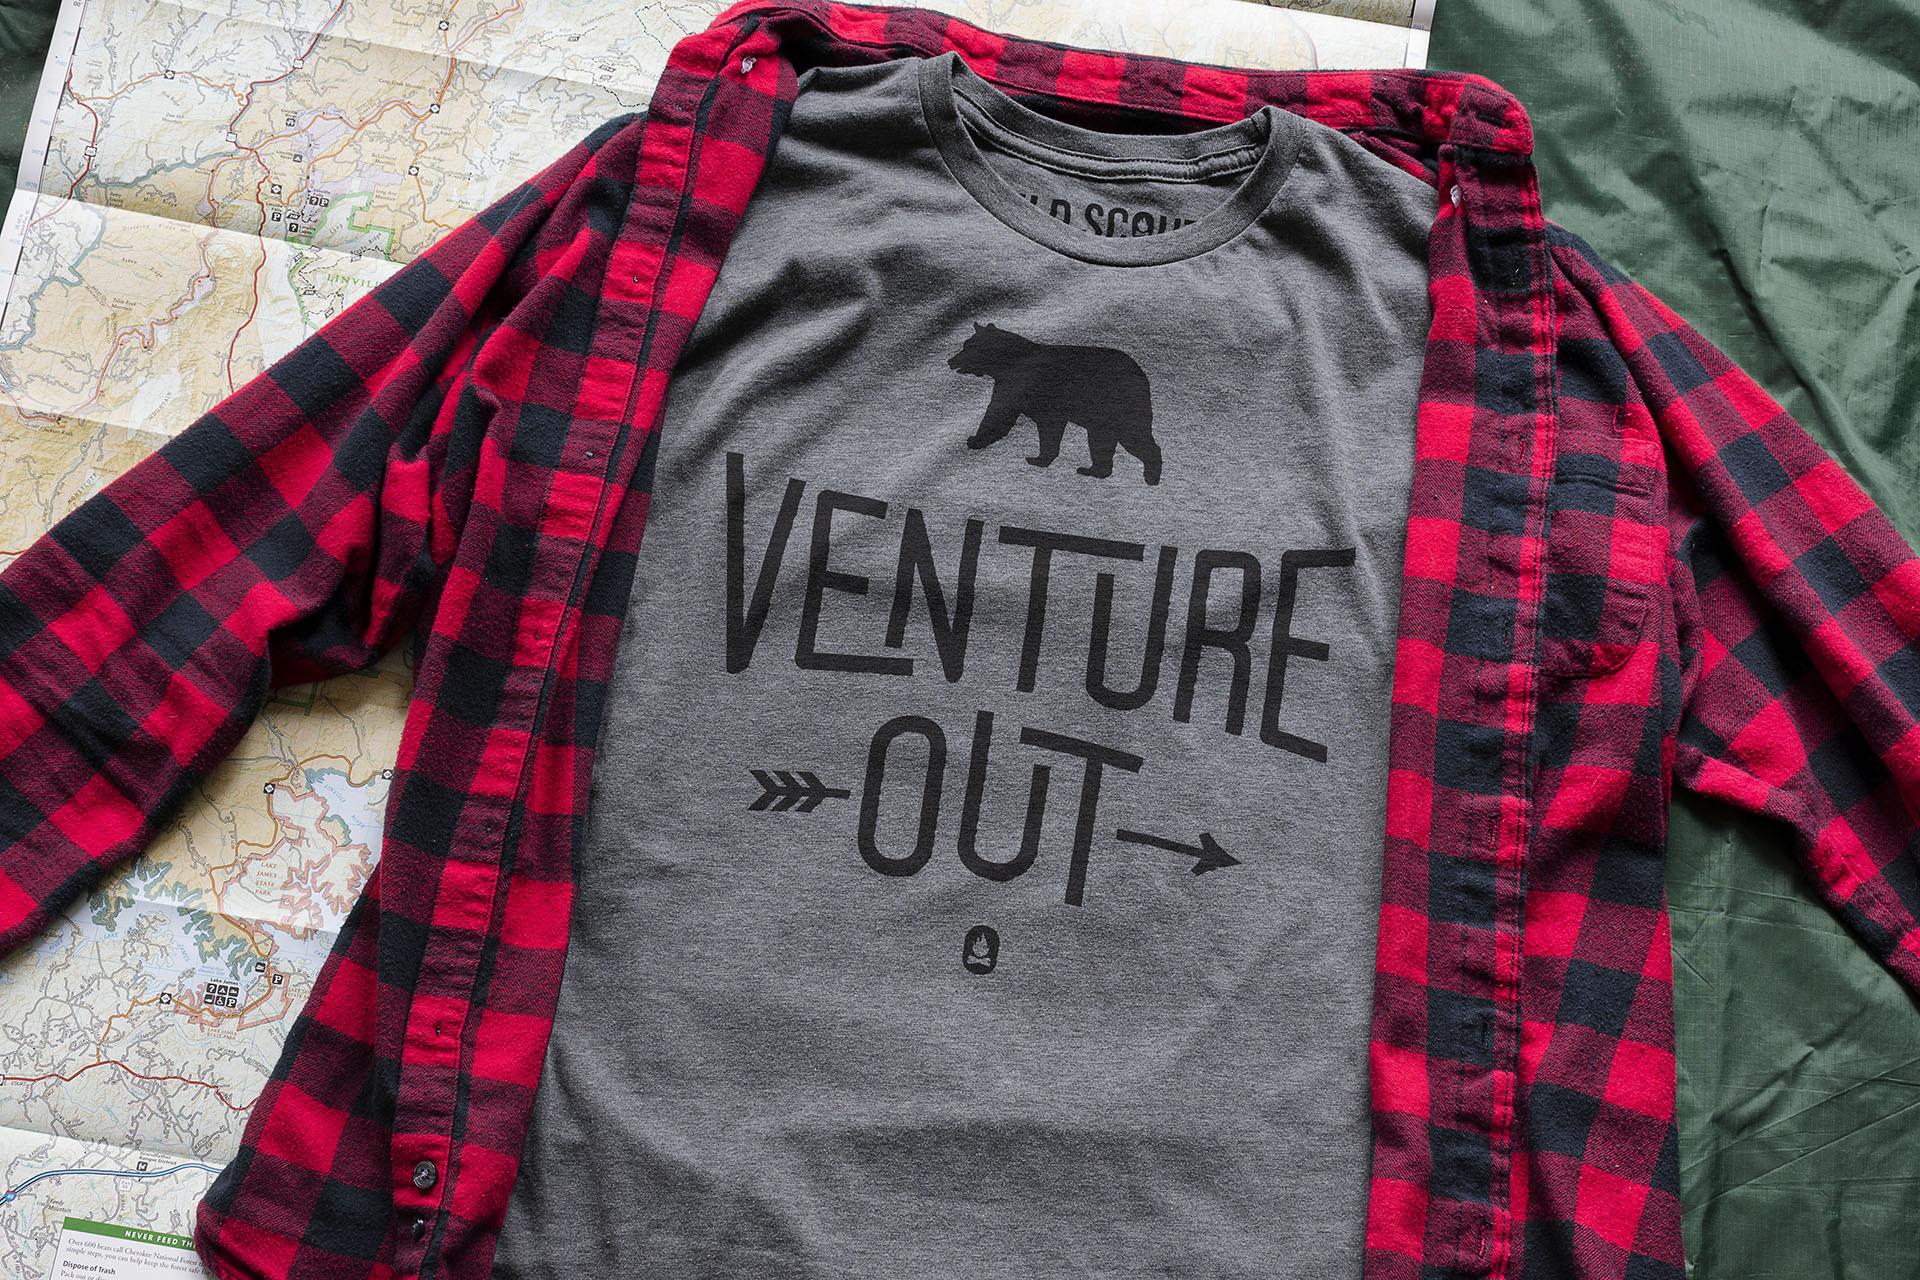 Venture Out Tshirt Design.jpg